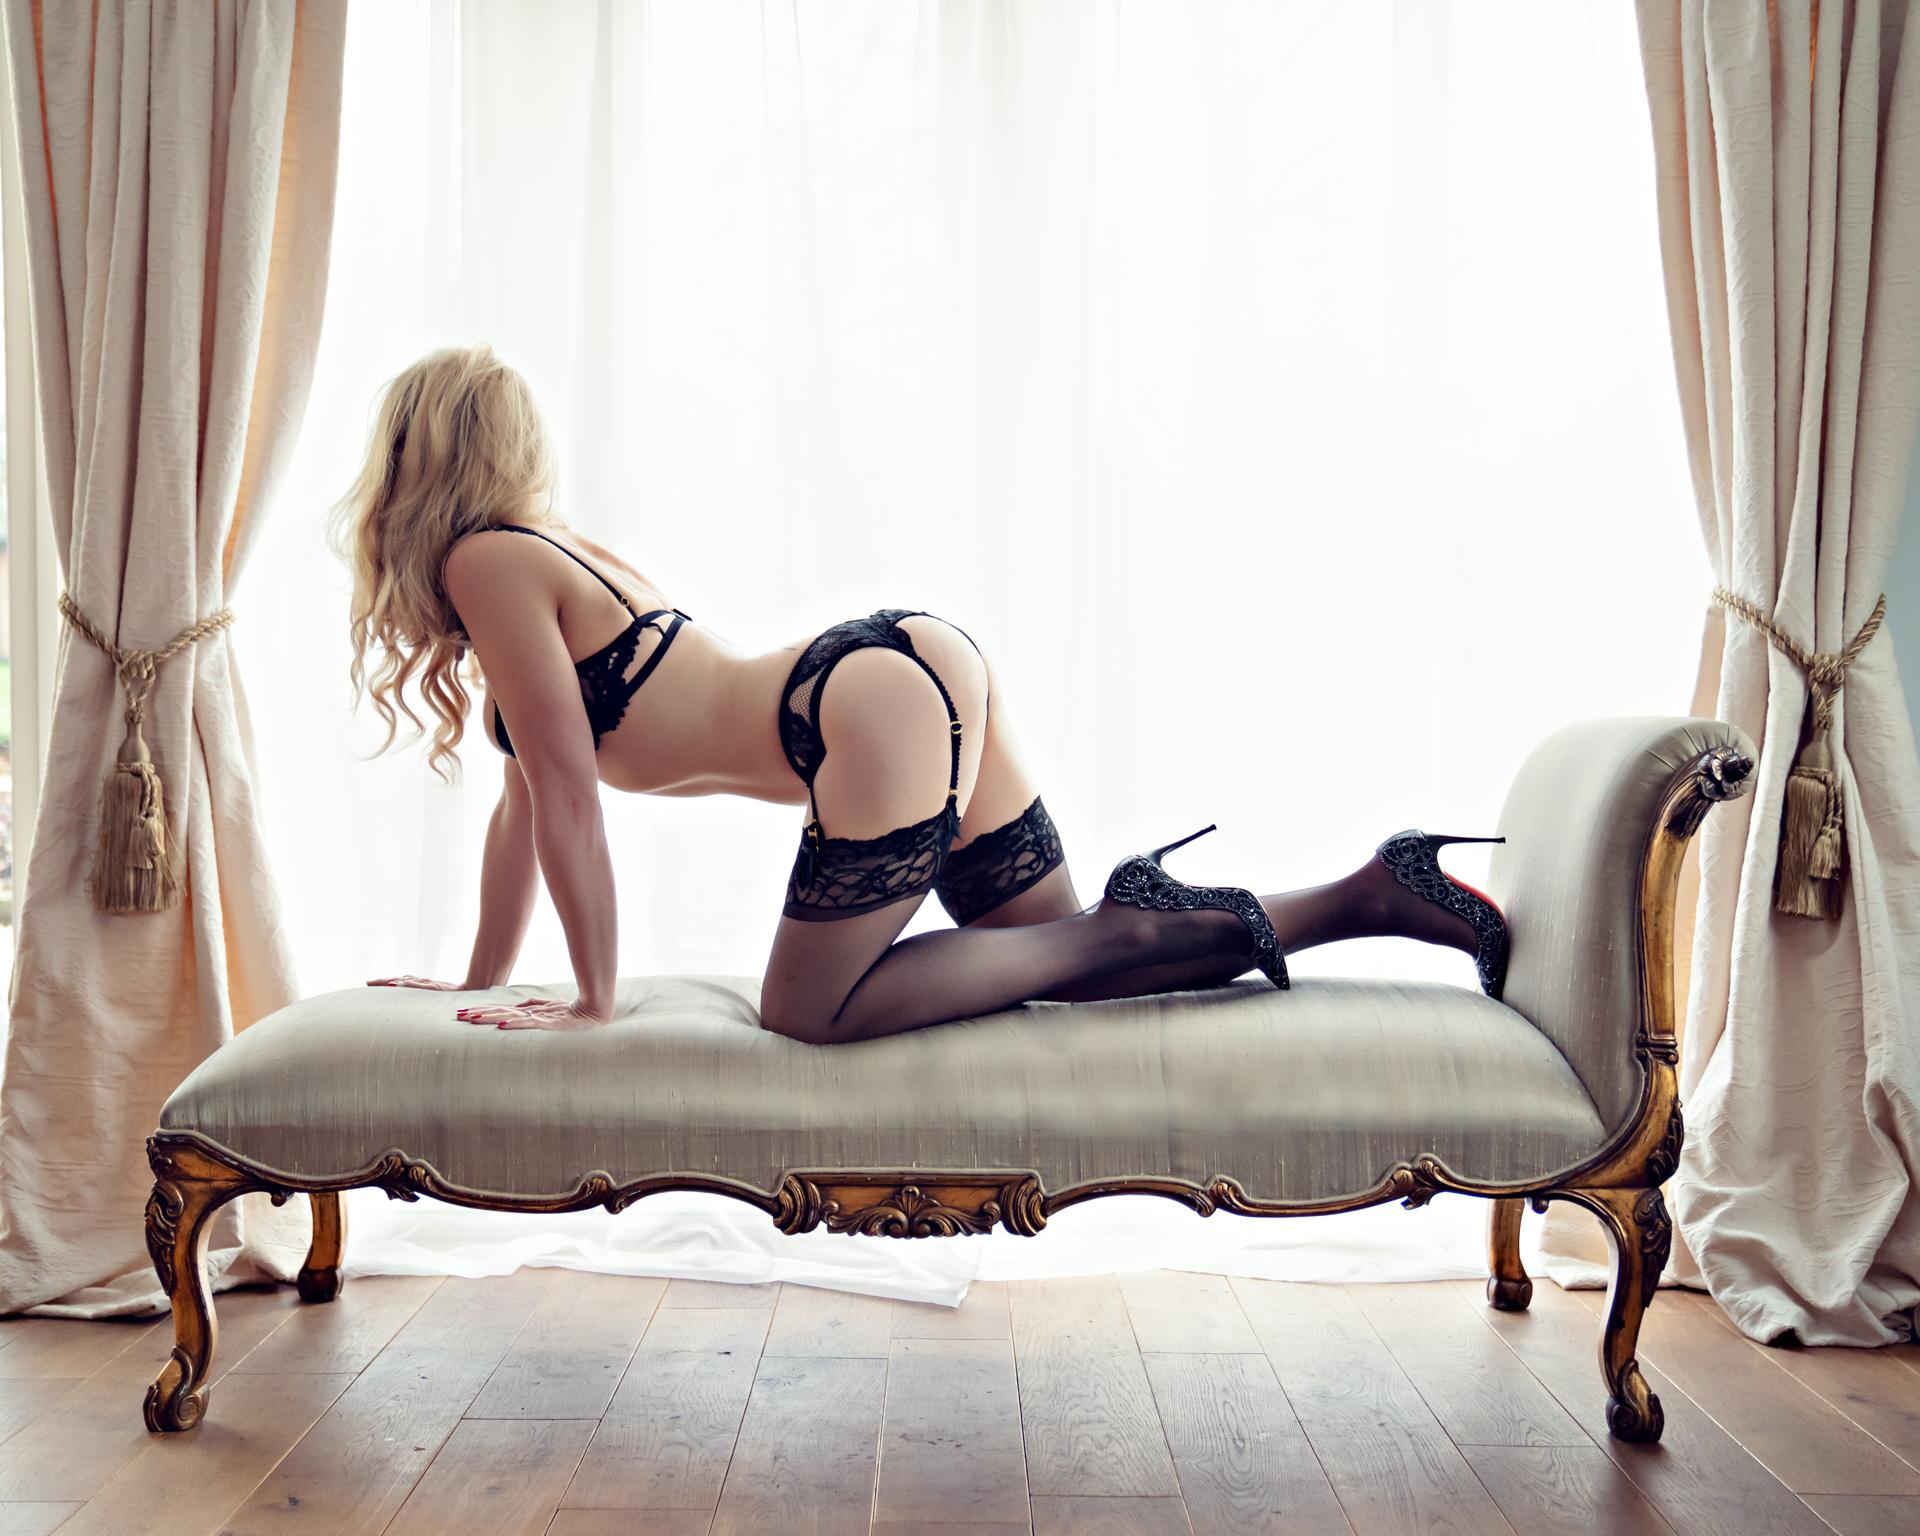 https://katehopewellsmith.com/wp-content/uploads/boudoir-photography-inspiration-kate-hopewell-smith-14.jpg